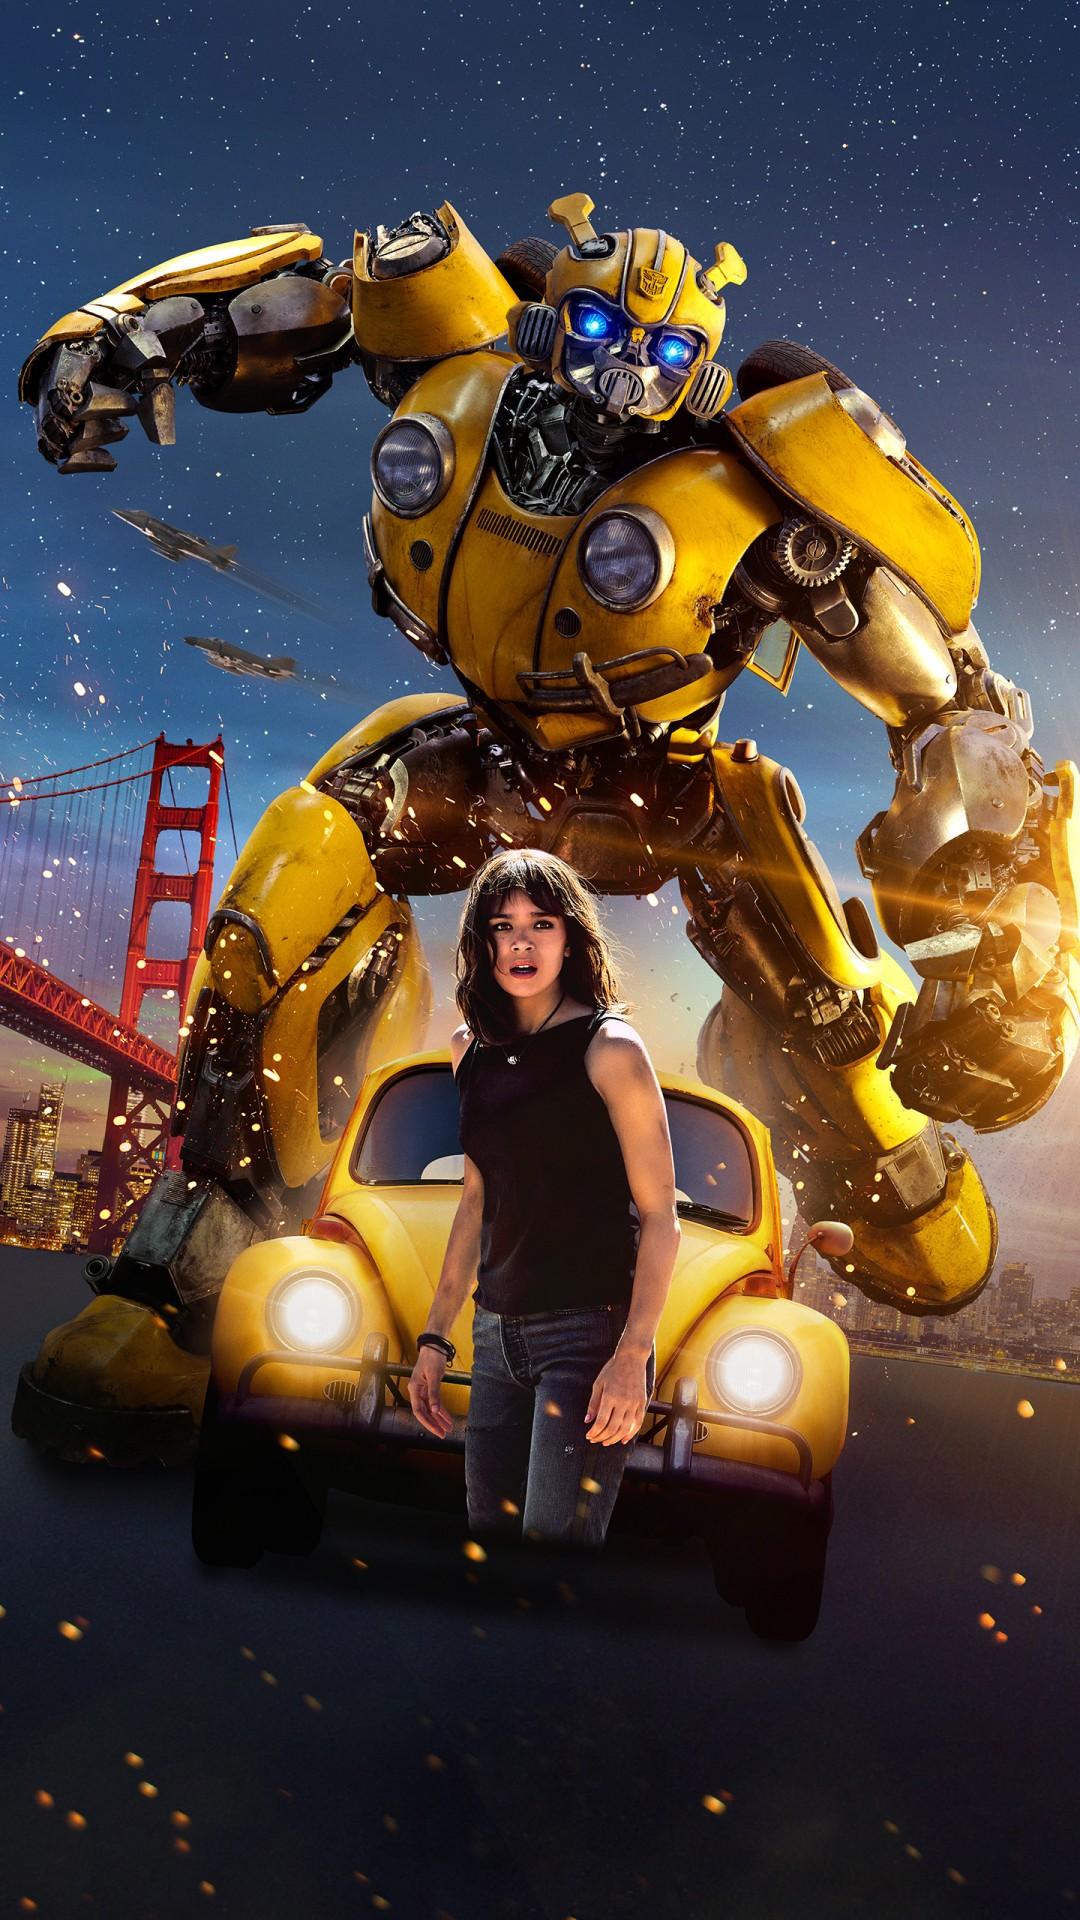 Iphone 5s Full Hd Wallpaper Bumblebee Movie 2018 5k Wallpapers Hd Wallpapers Id 26834